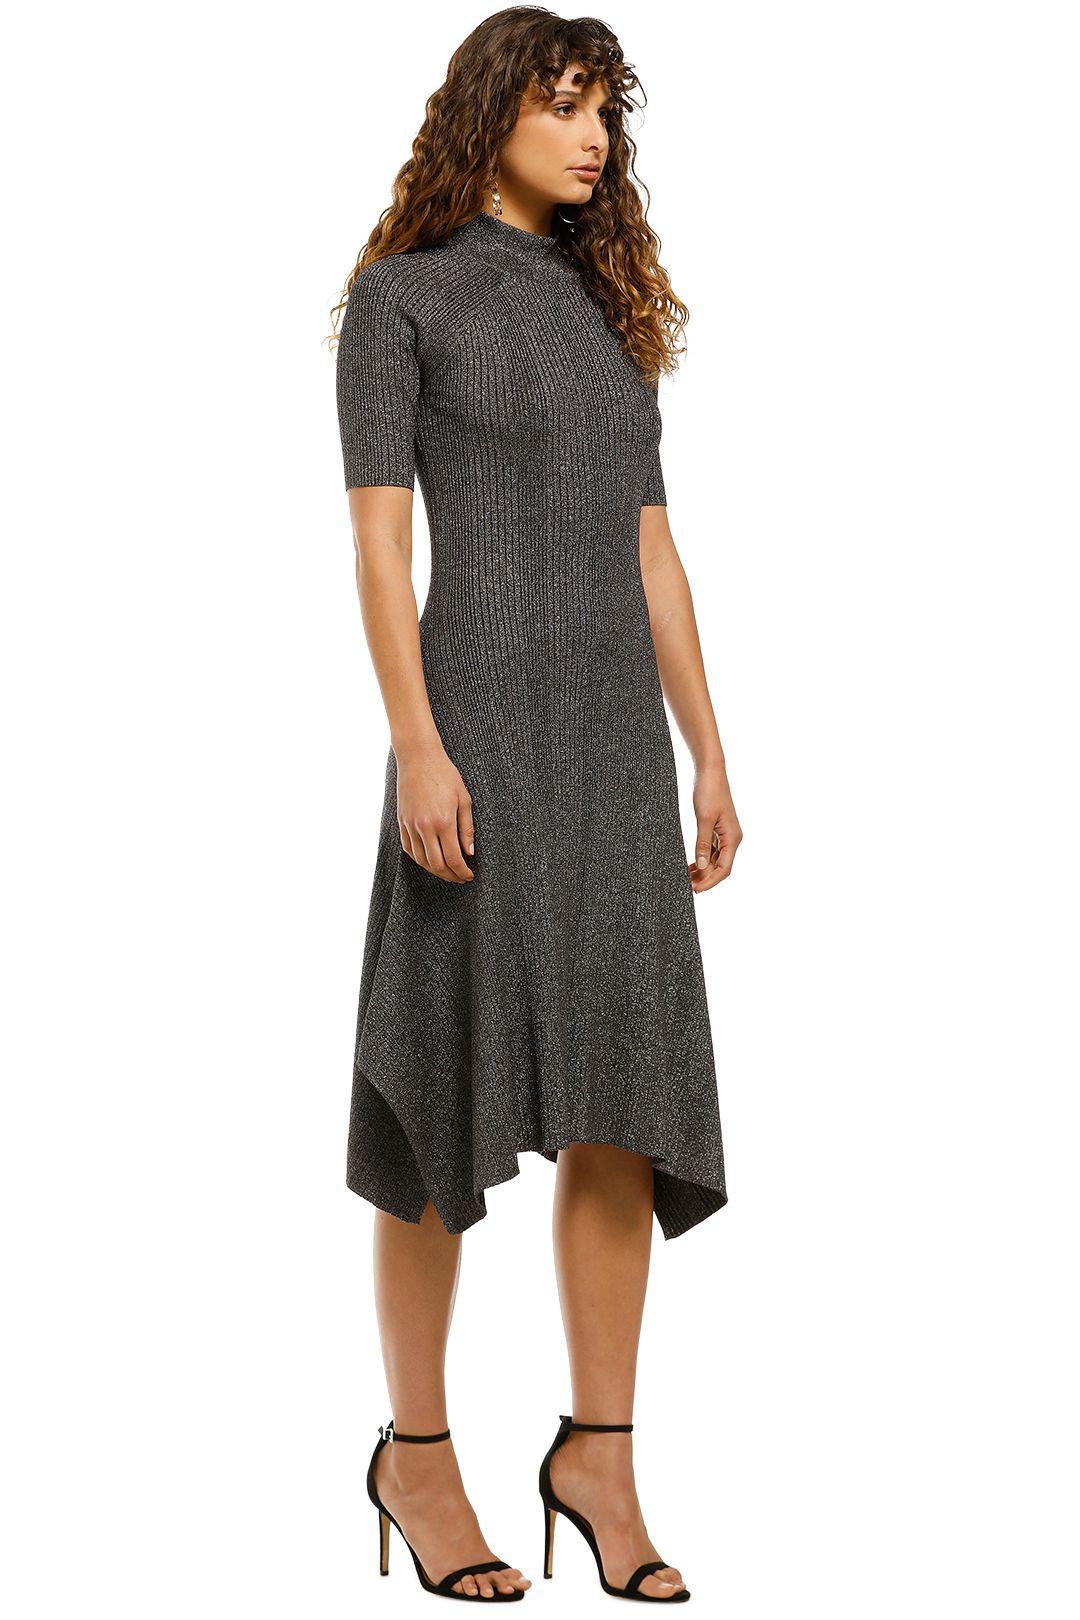 Husk-Glitter-Knit-Dress-Grey-Side